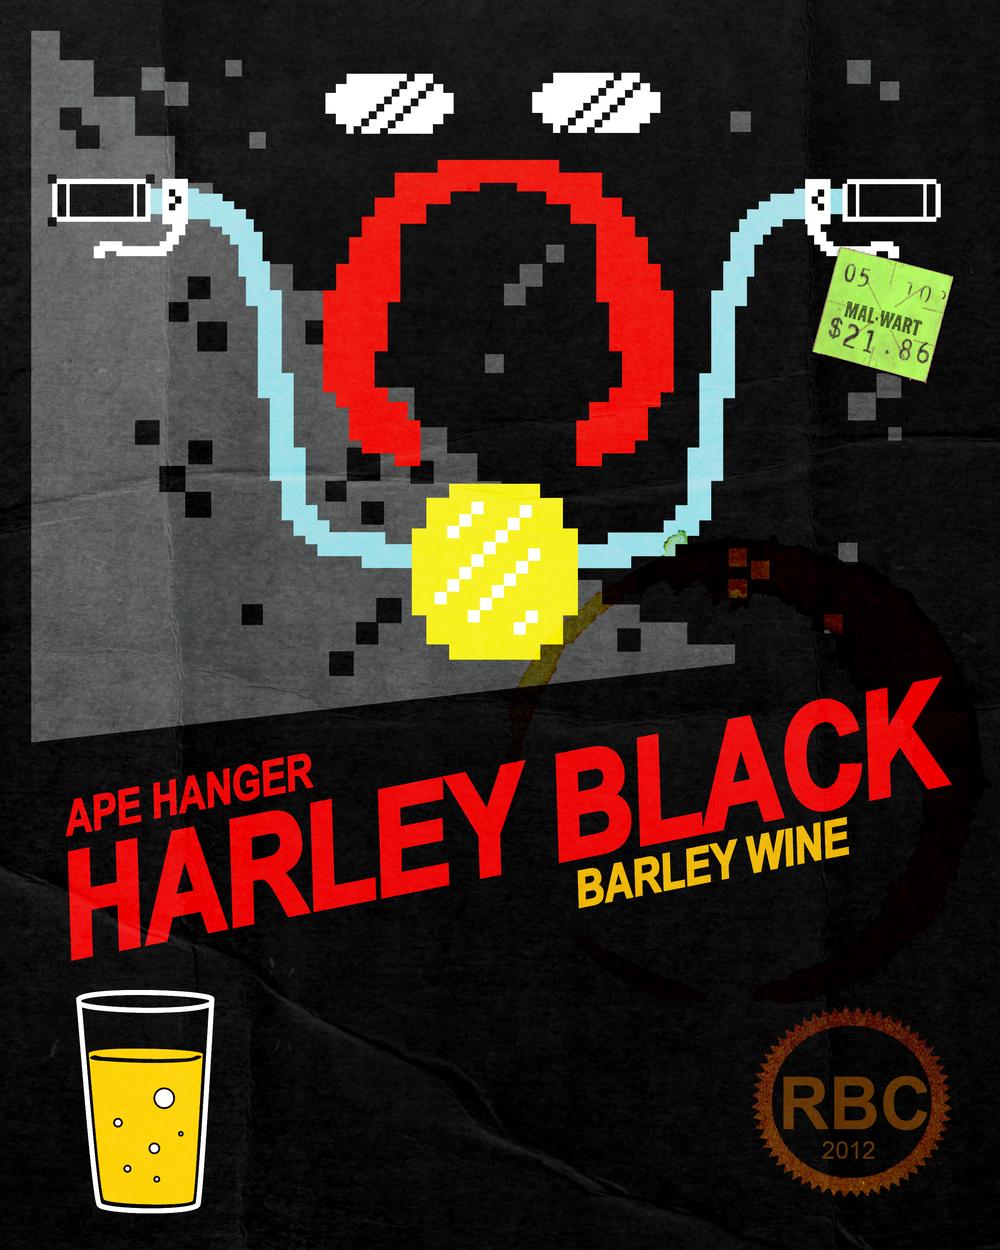 """Ape Hanger - Harley Black Barley Wine"", - concept, for non-profit"